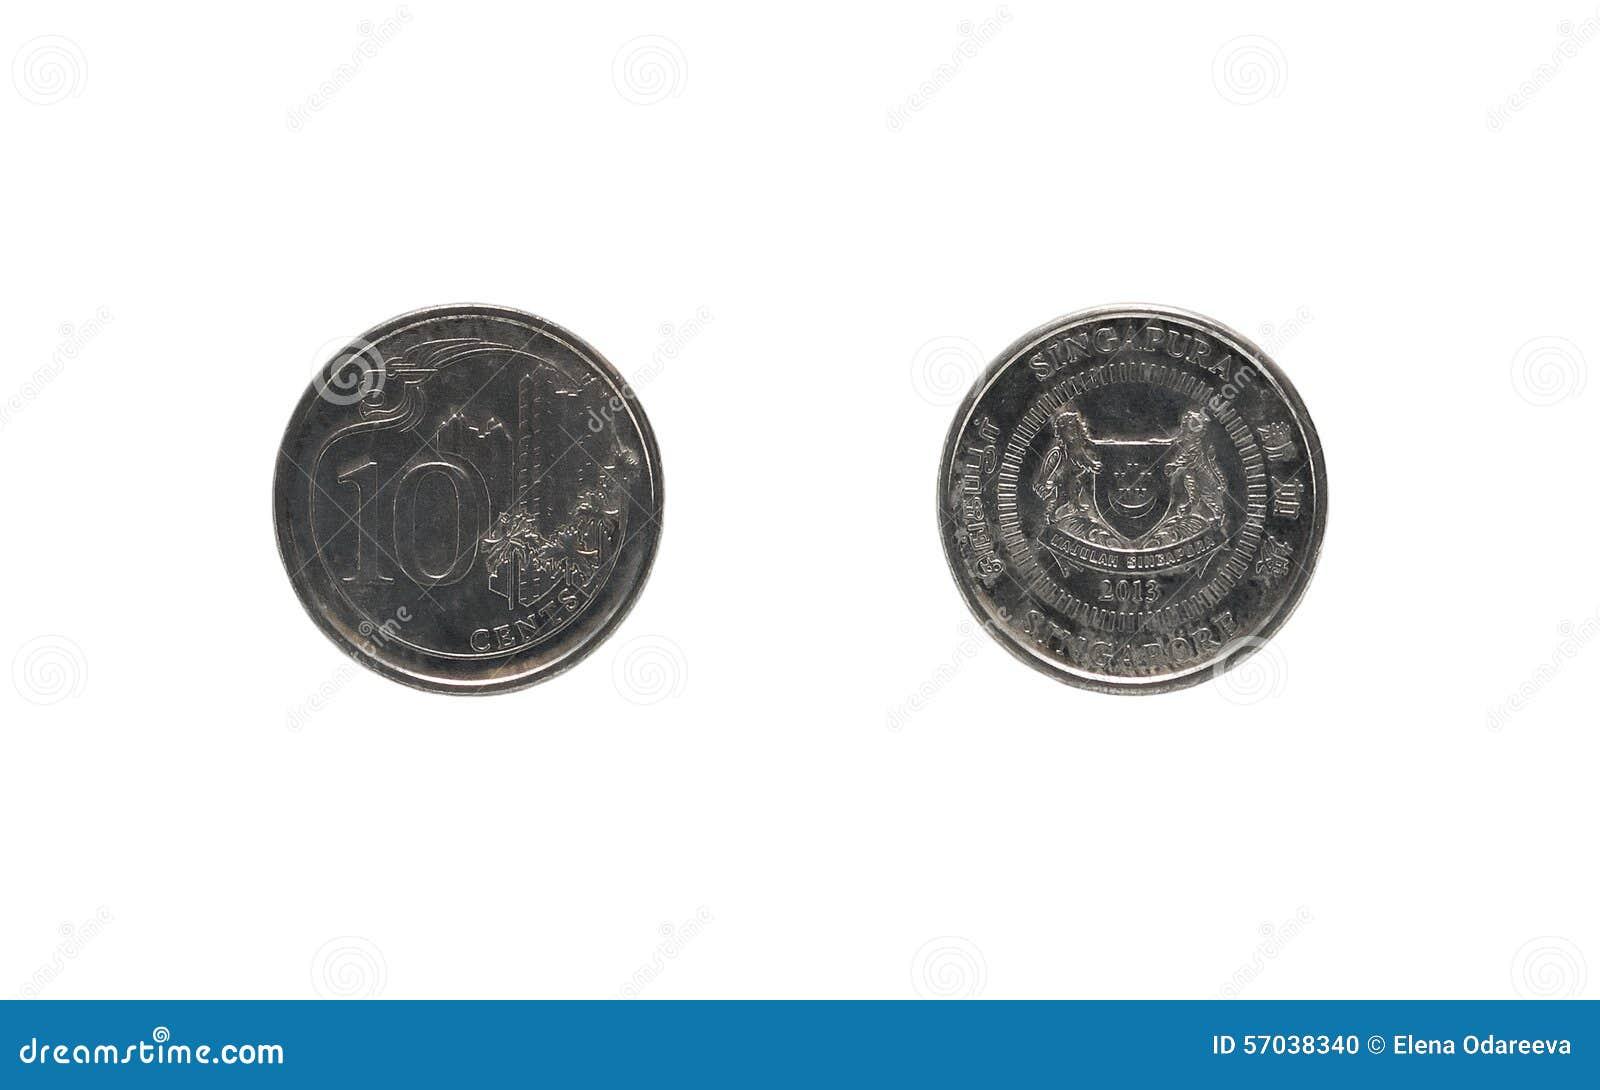 Moeda singapurense de dez centavos